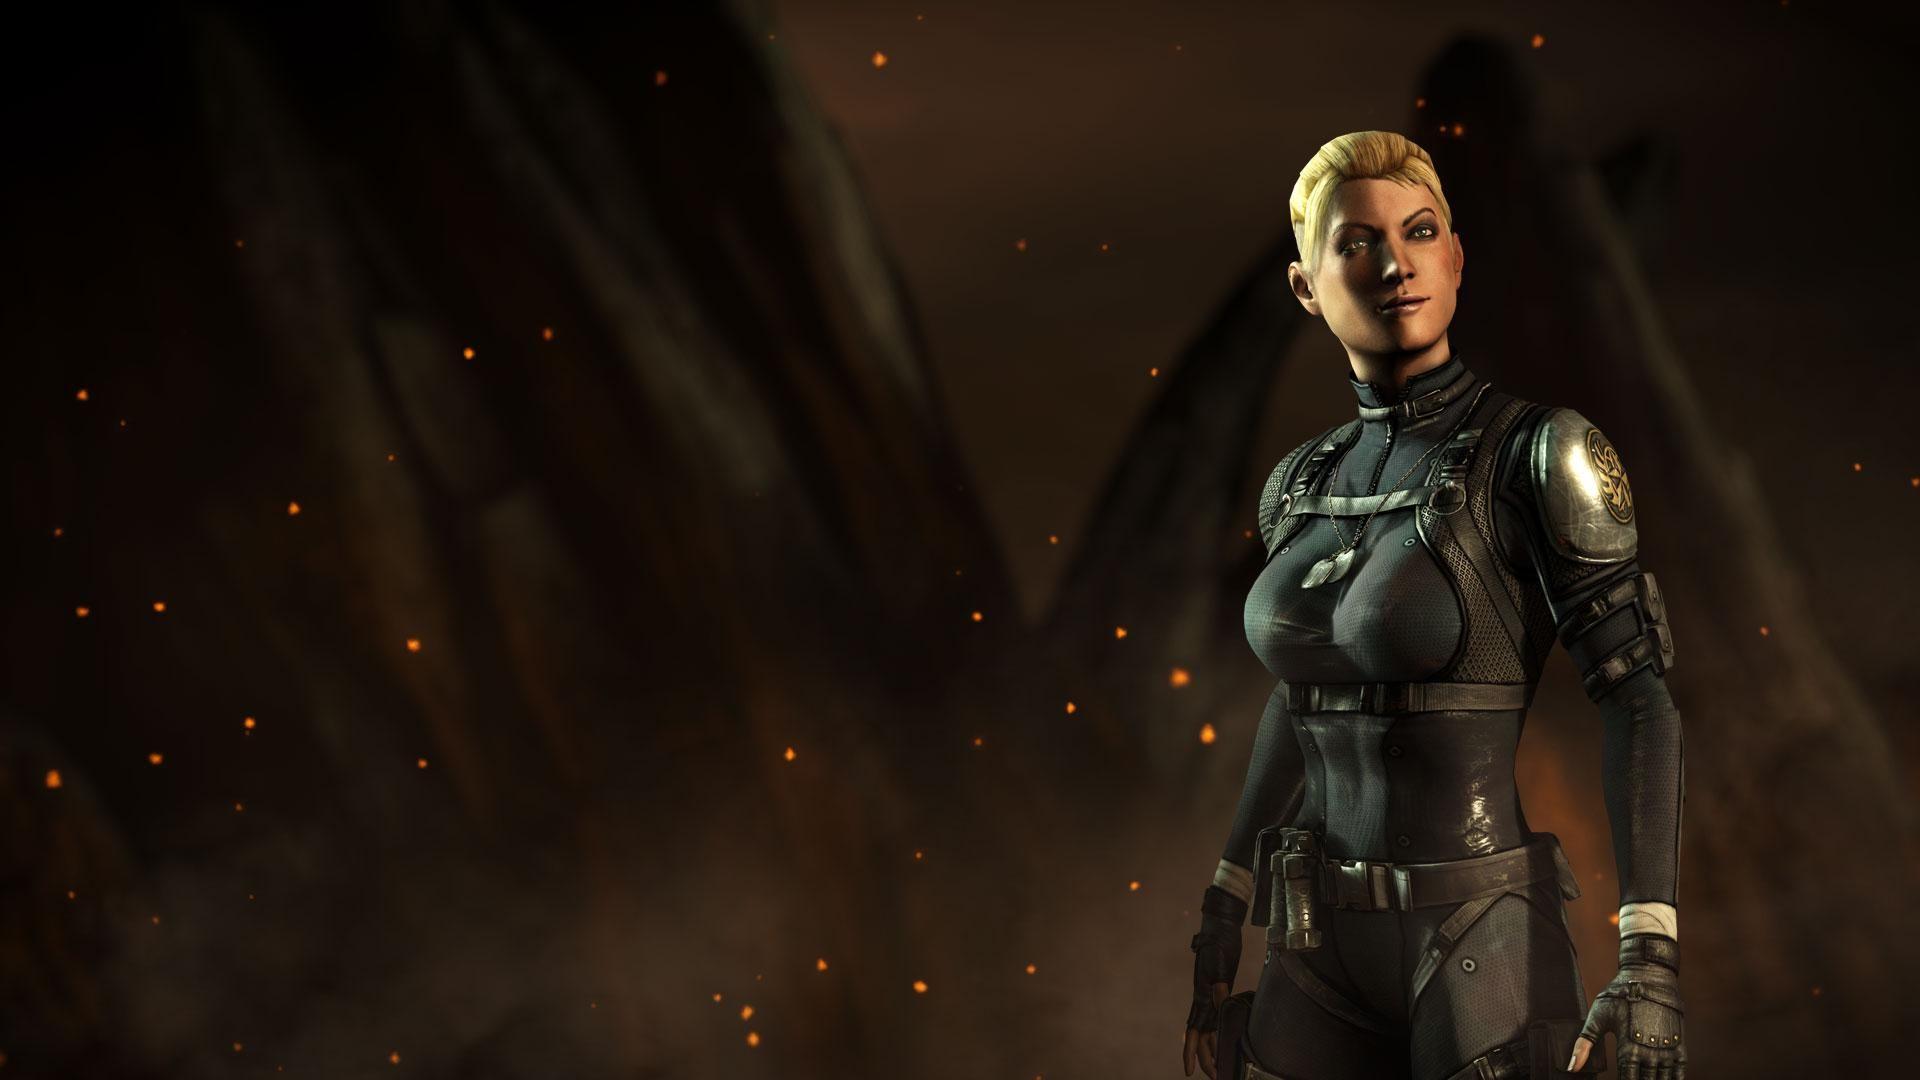 Cassie Cage Mortal Kombat X Mortal Kombat X Characters Mortal